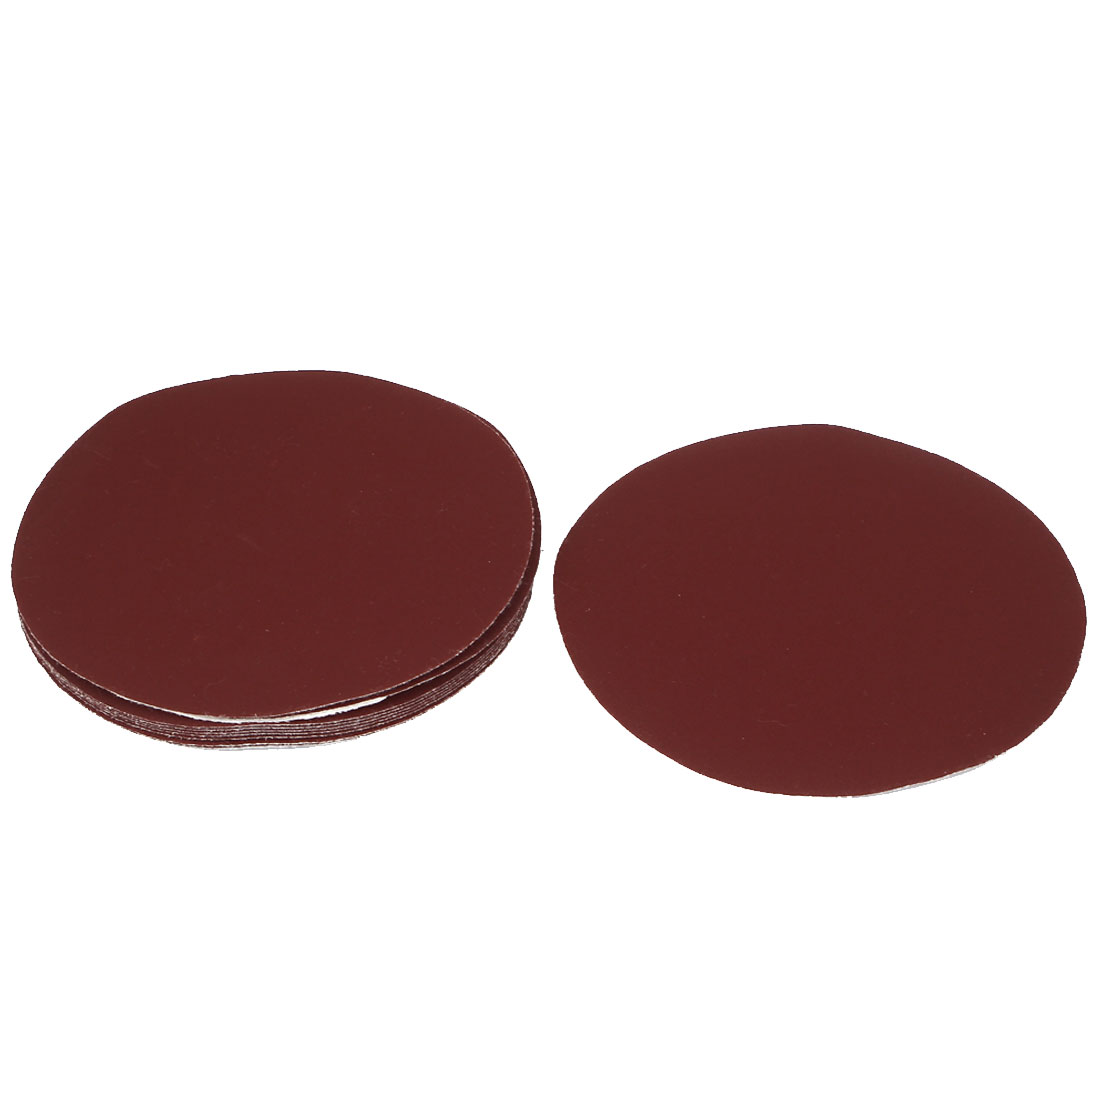 "6"" Round Hook and Loop Fastener Polishing Sanding Sandpaper Disc 320 Grit 10 Pcs"